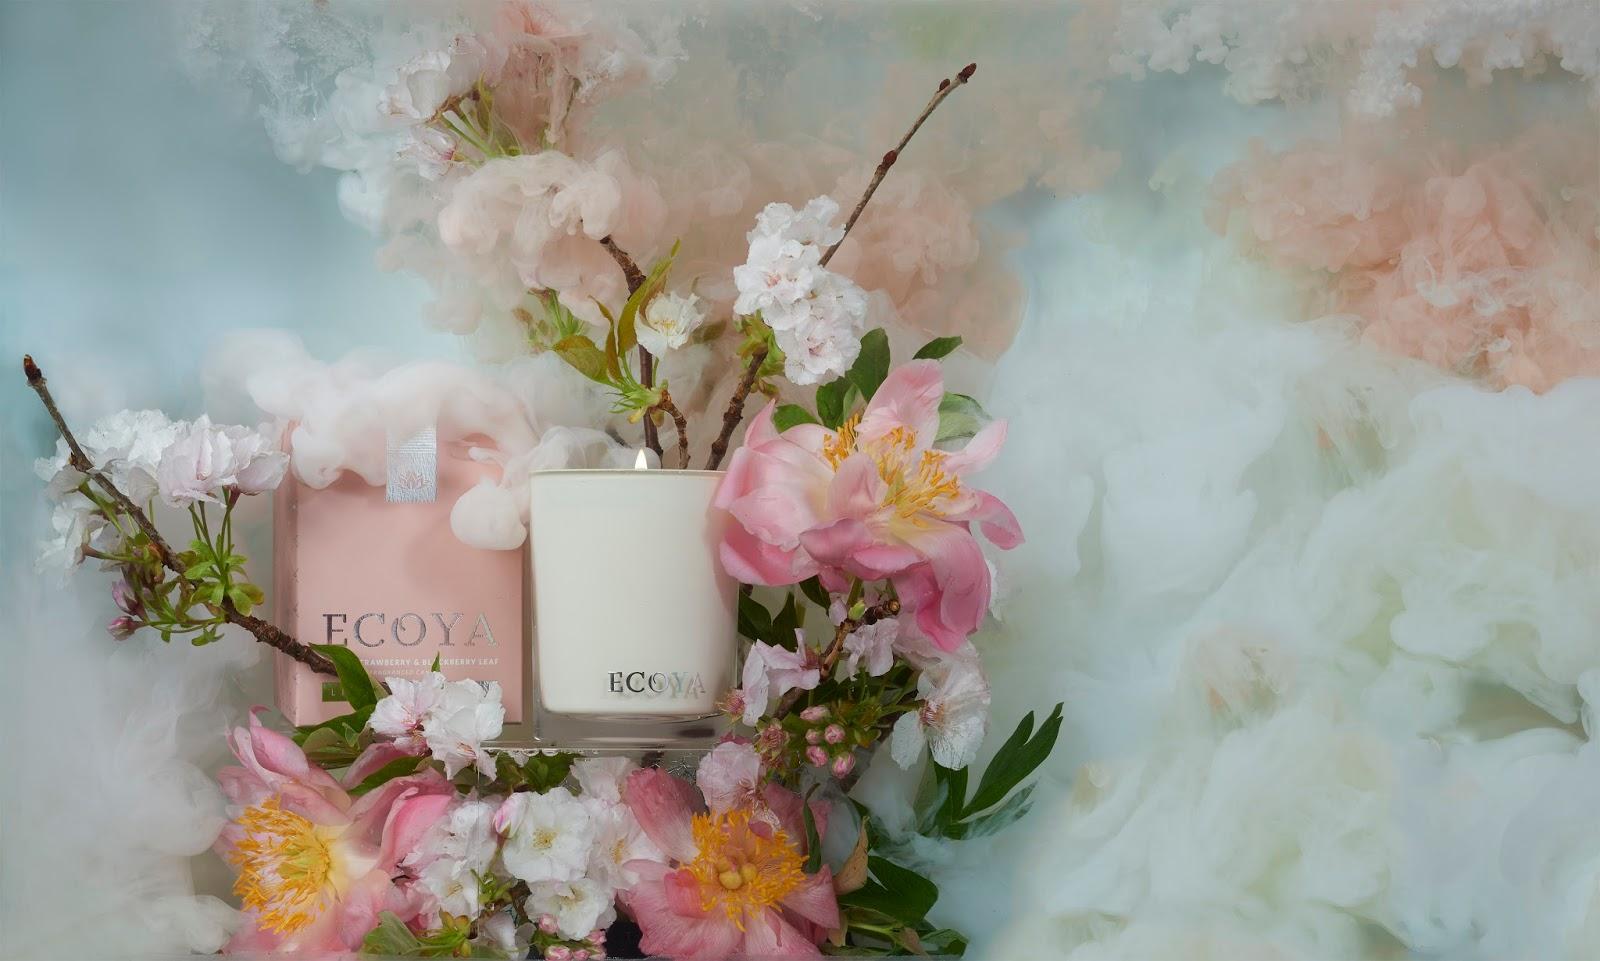 ecoya-limited-editions-by-georgia-malyon-sweet-strawberry-blackberry-leaf